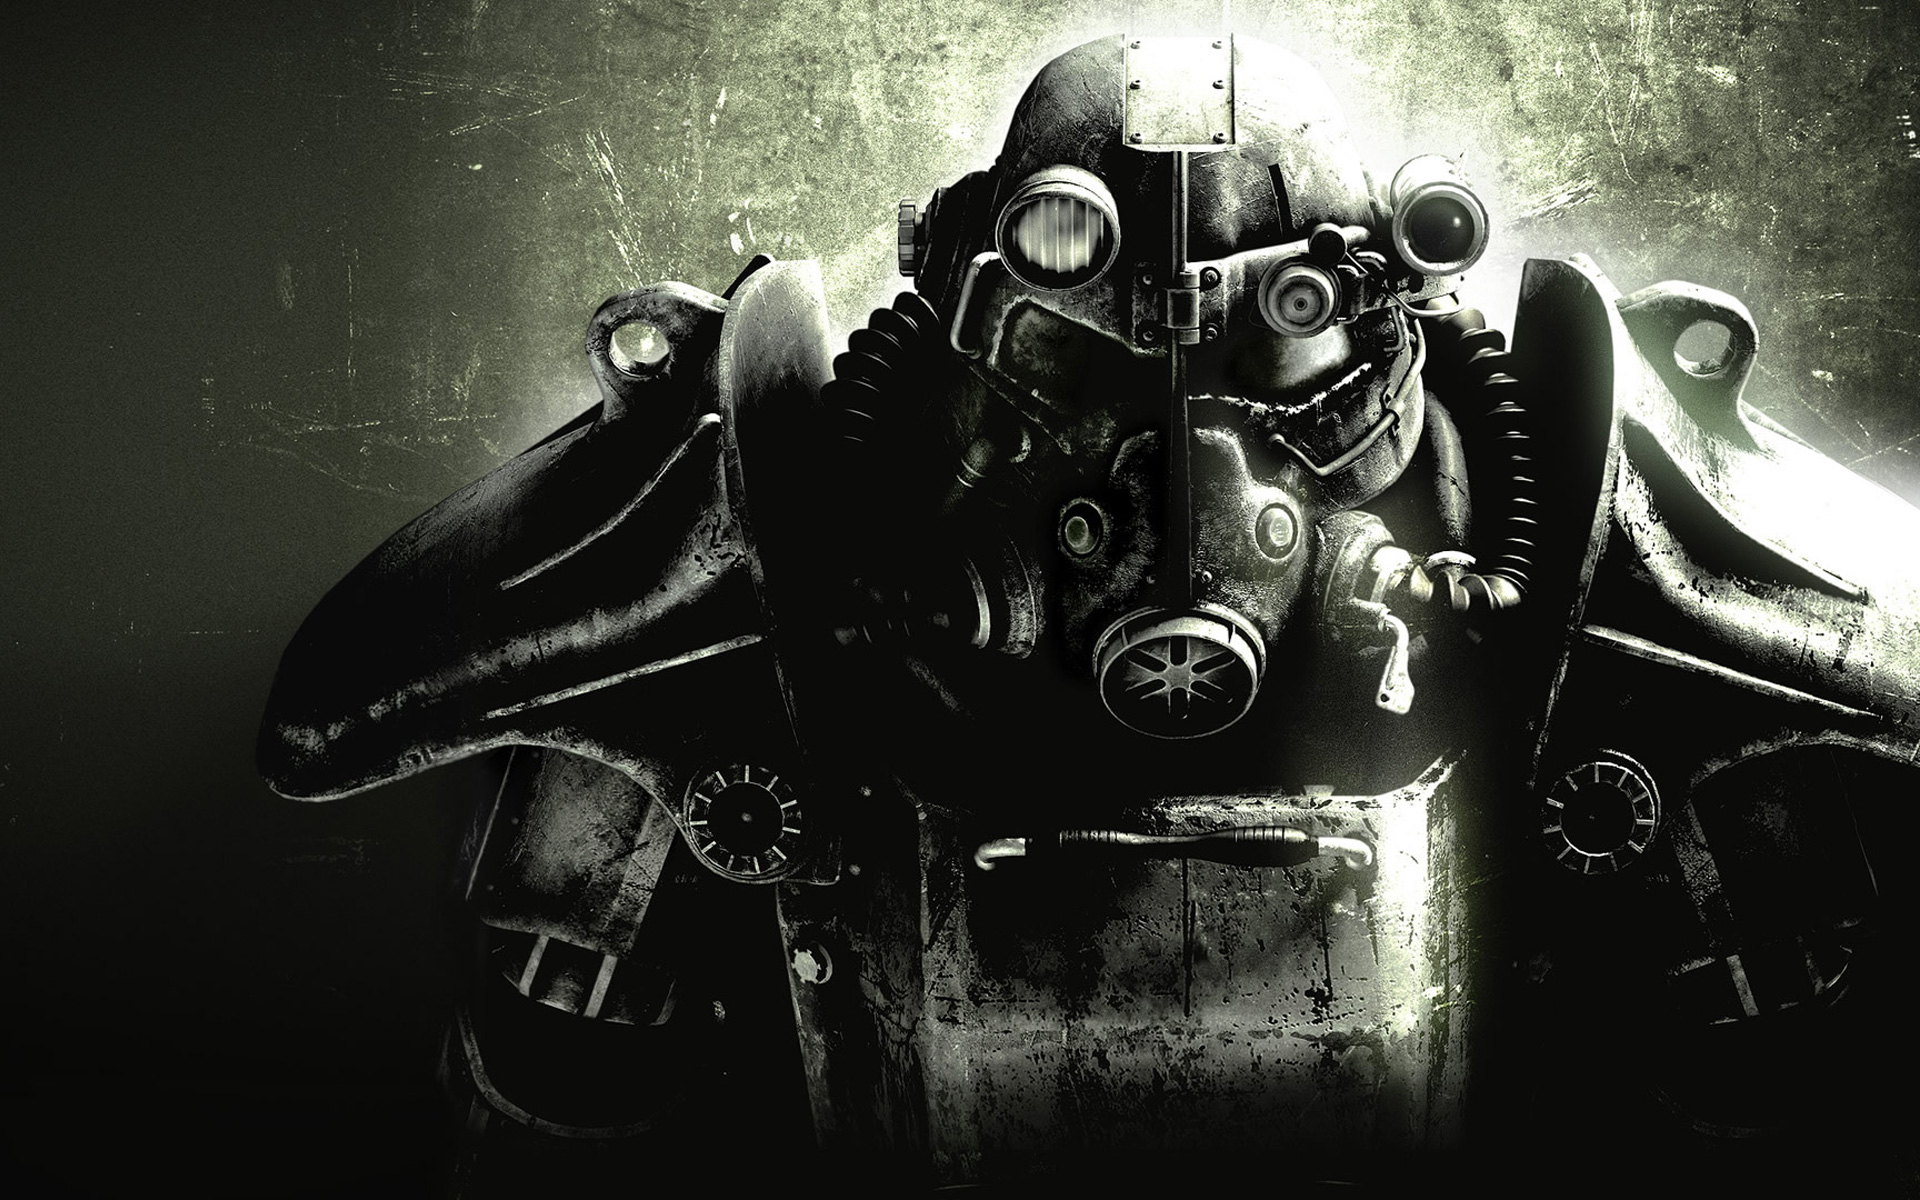 Free Fallout 3 Wallpaper in 1920x1200